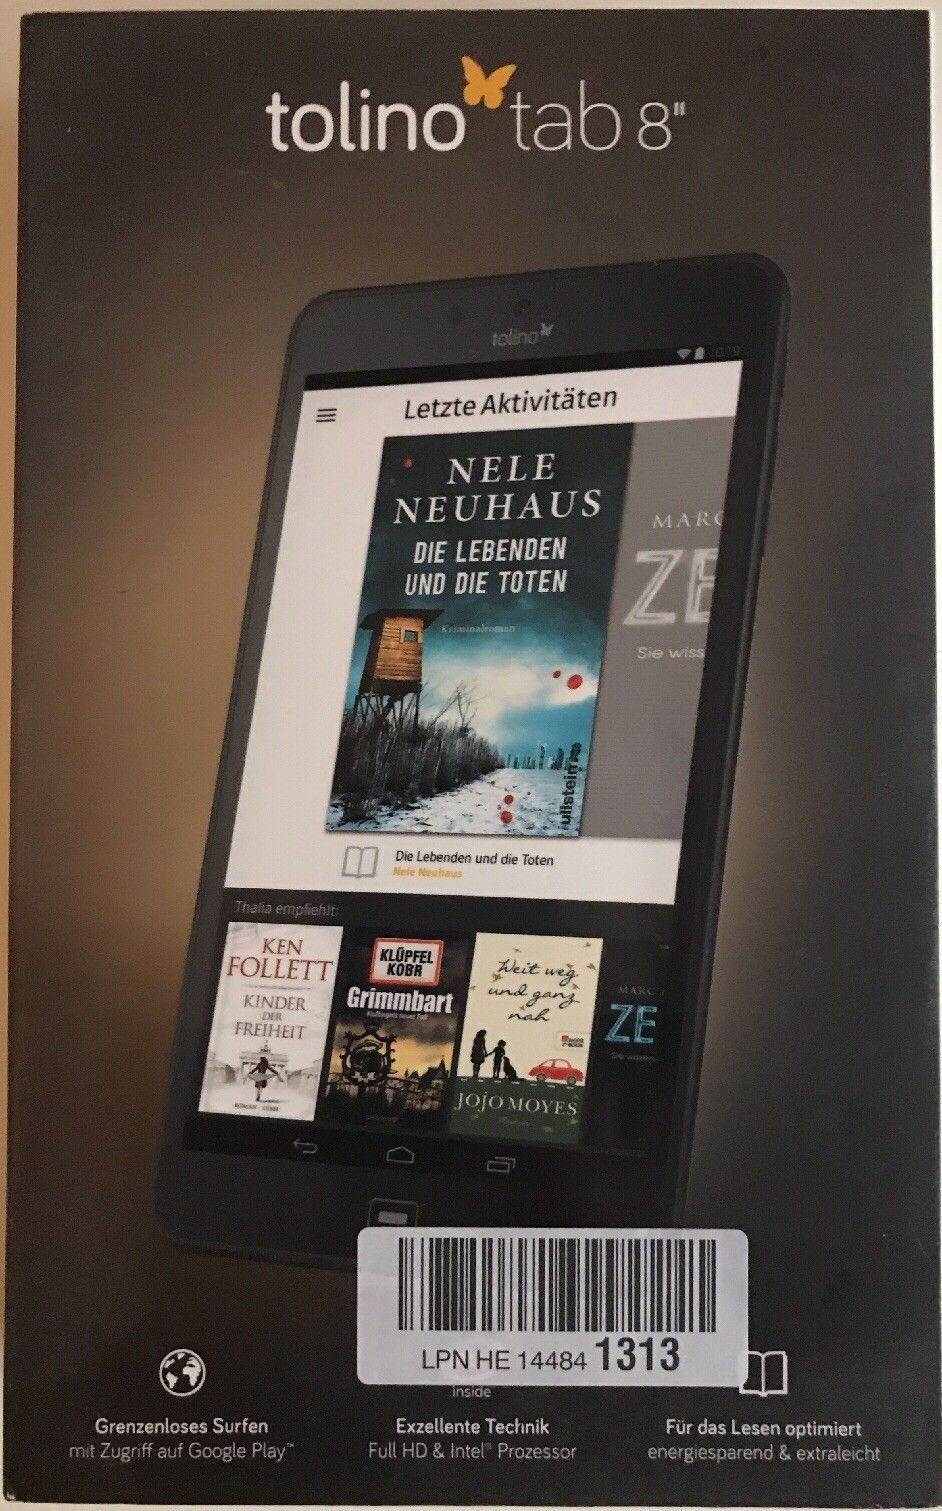 Tolino Tab 8 16GB, WLAN, 20,3 cm (8 Zoll) - Schwarz - Tablet mit Android